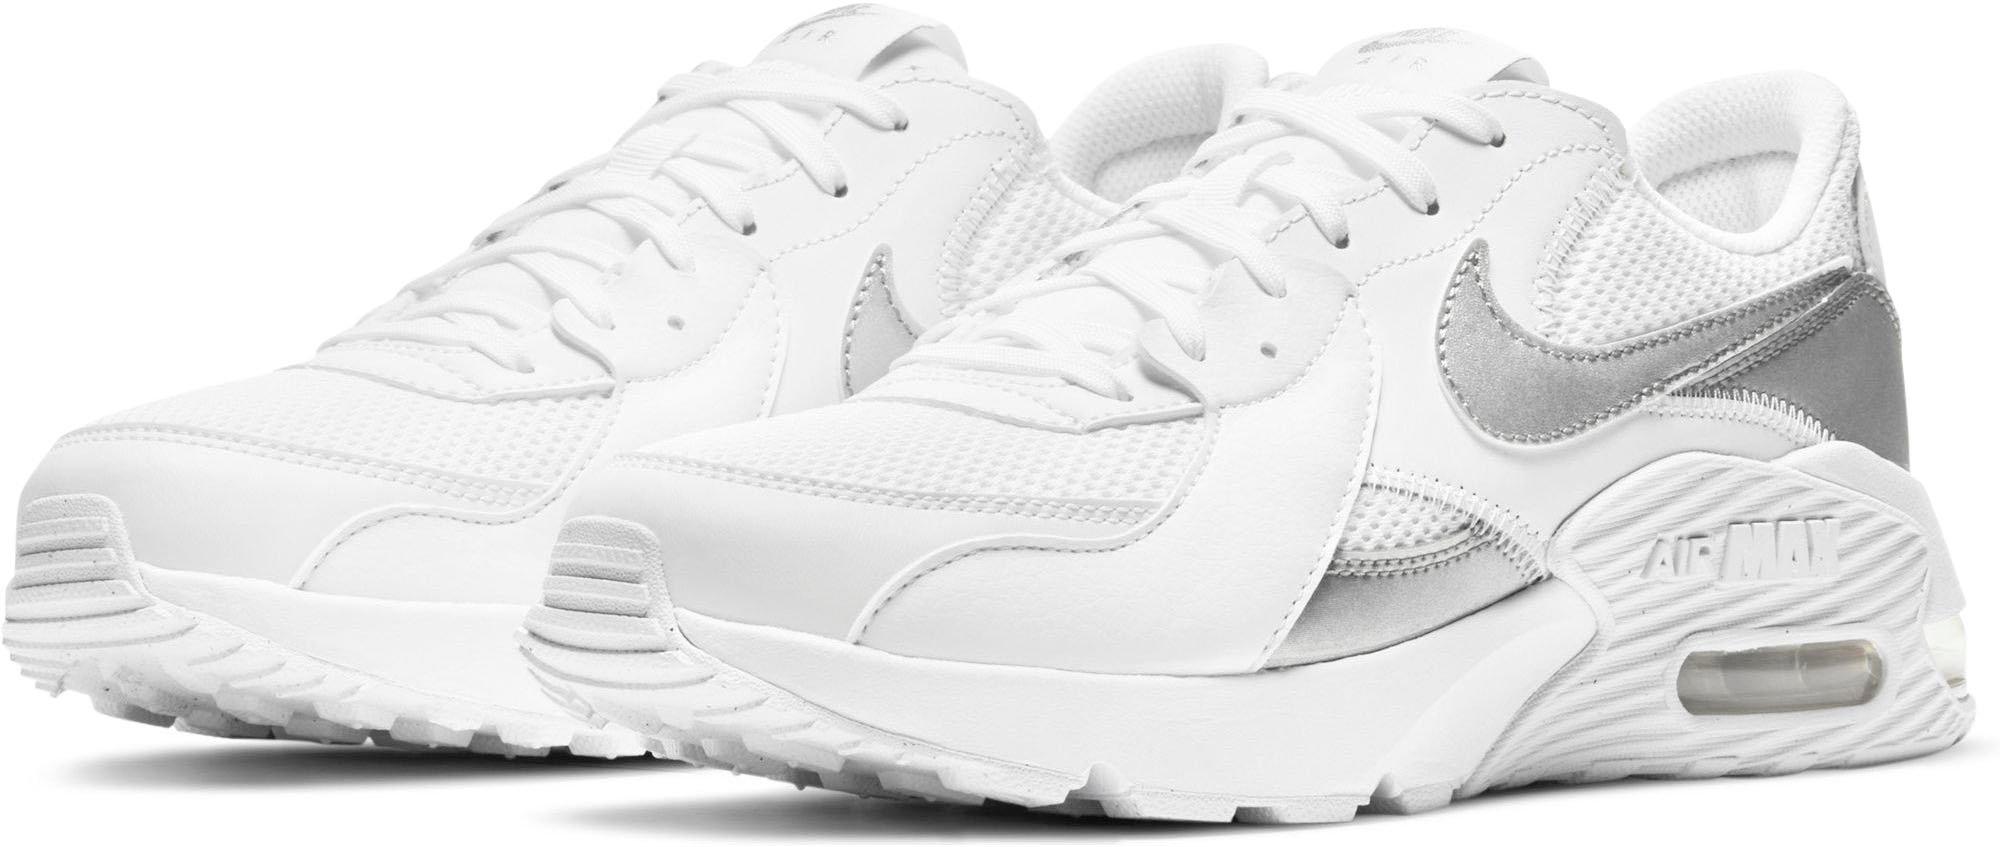 Nike Sportswear sneakers WMNS AIR MAX EXCEE - verschillende betaalmethodes